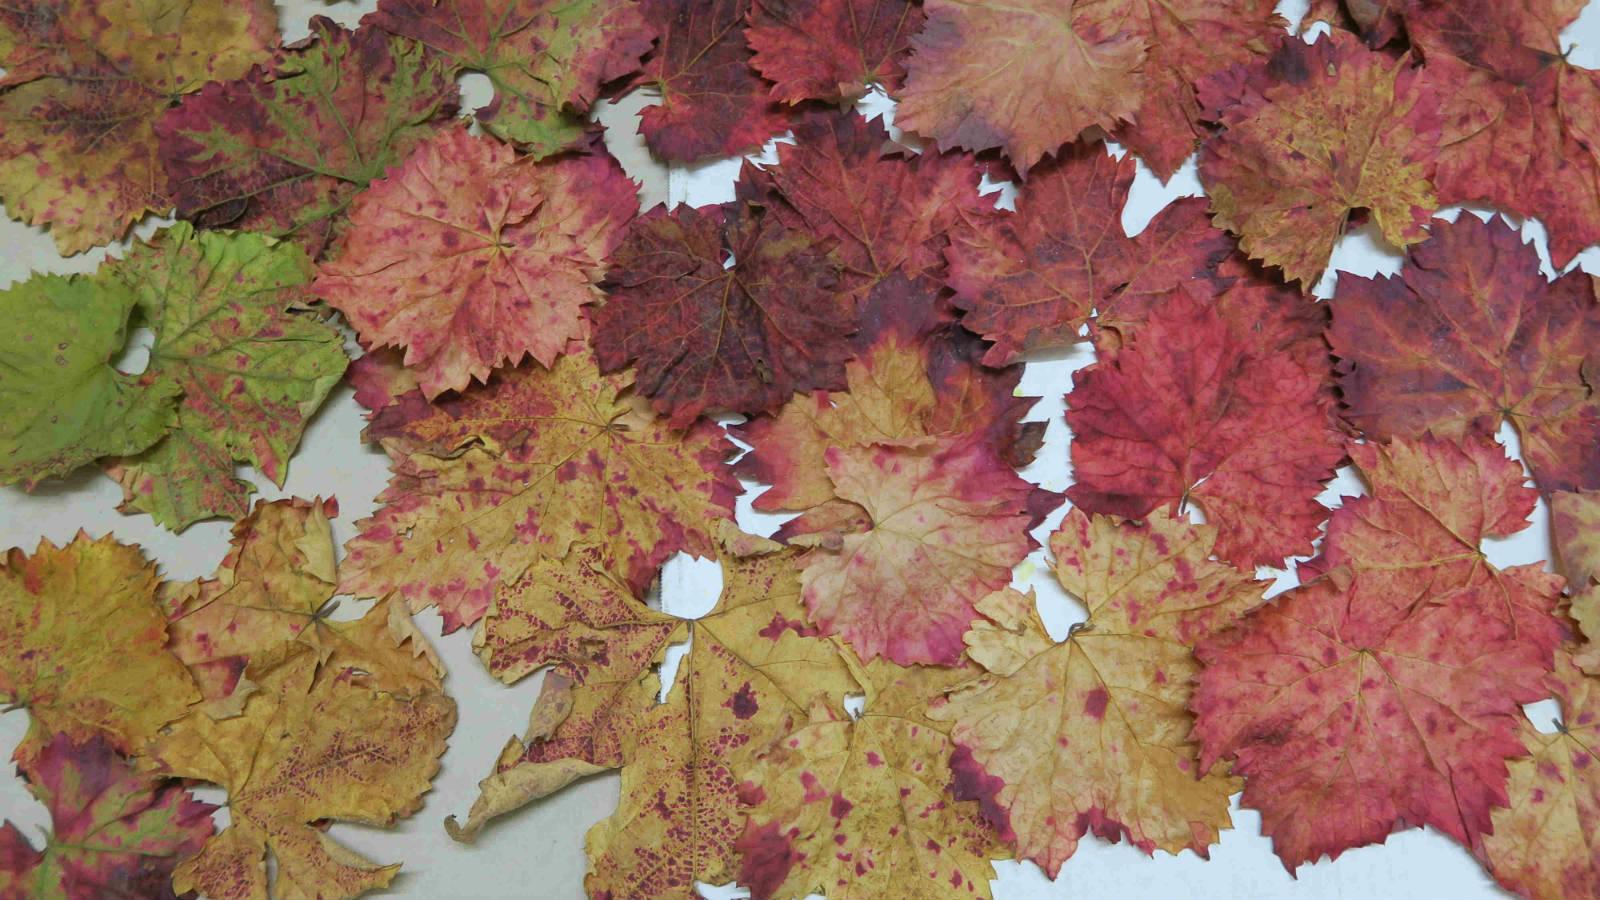 Sagrantino 的葡萄葉,入秋後會轉紅,所以 Sagrantino 的葡萄園會在紅綠紛陳。